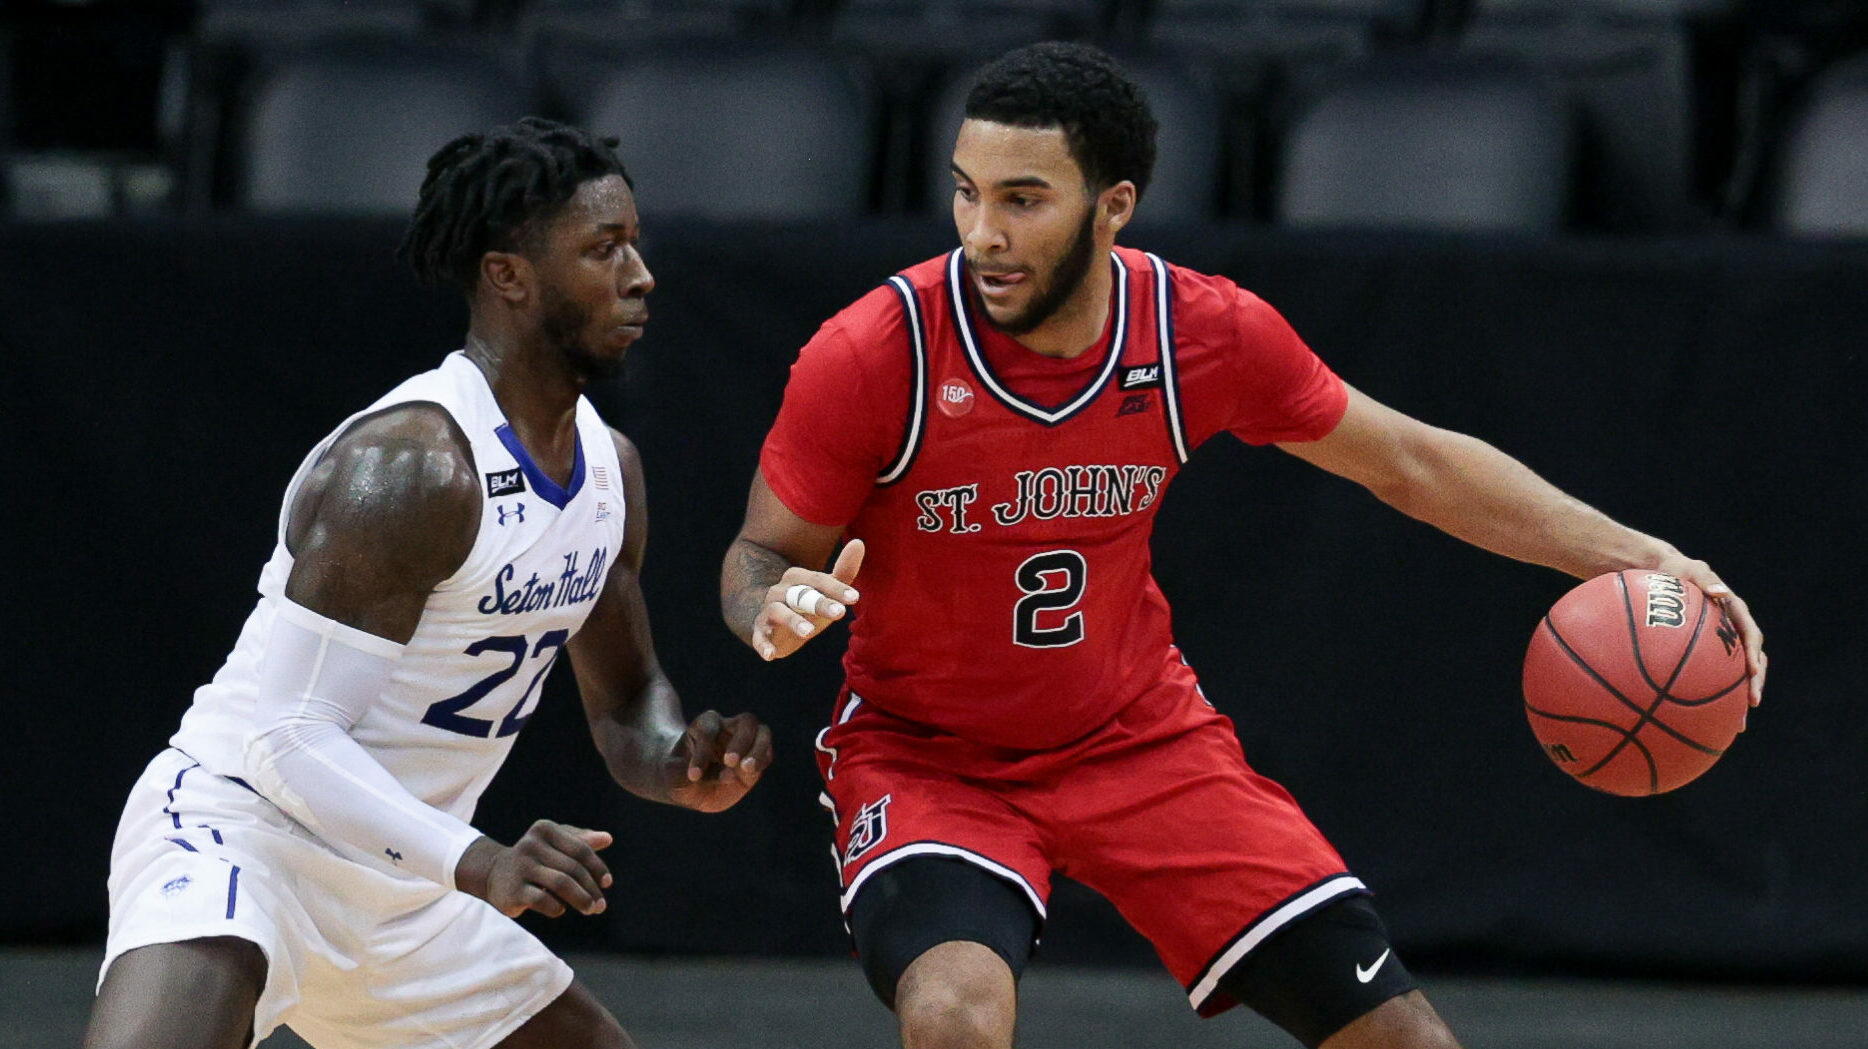 St. John's sophomore Champagnie to enter NBA draft process